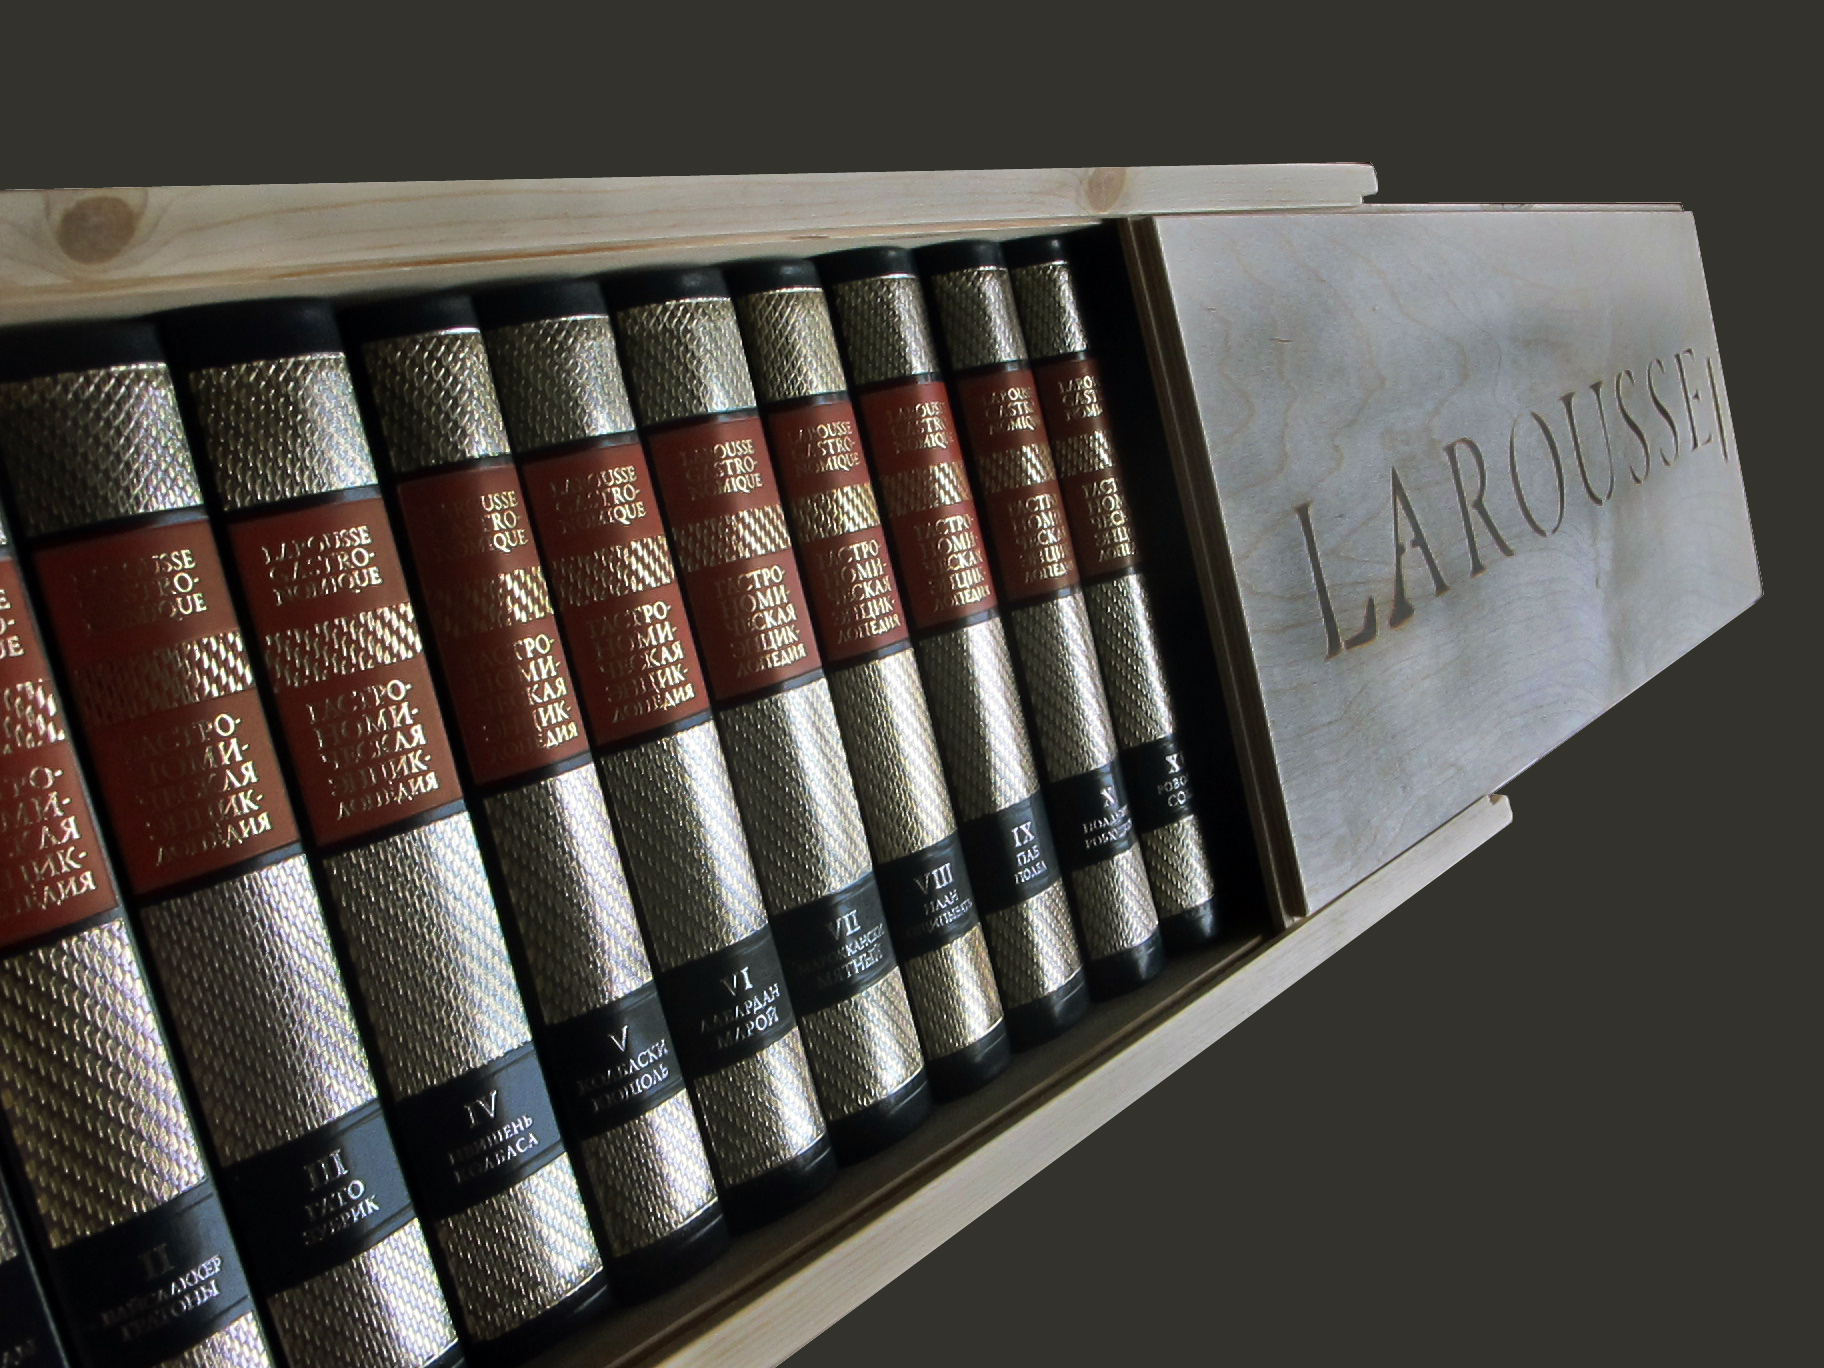 Larousse gastronomique, Ledercover, full complet, 16 books